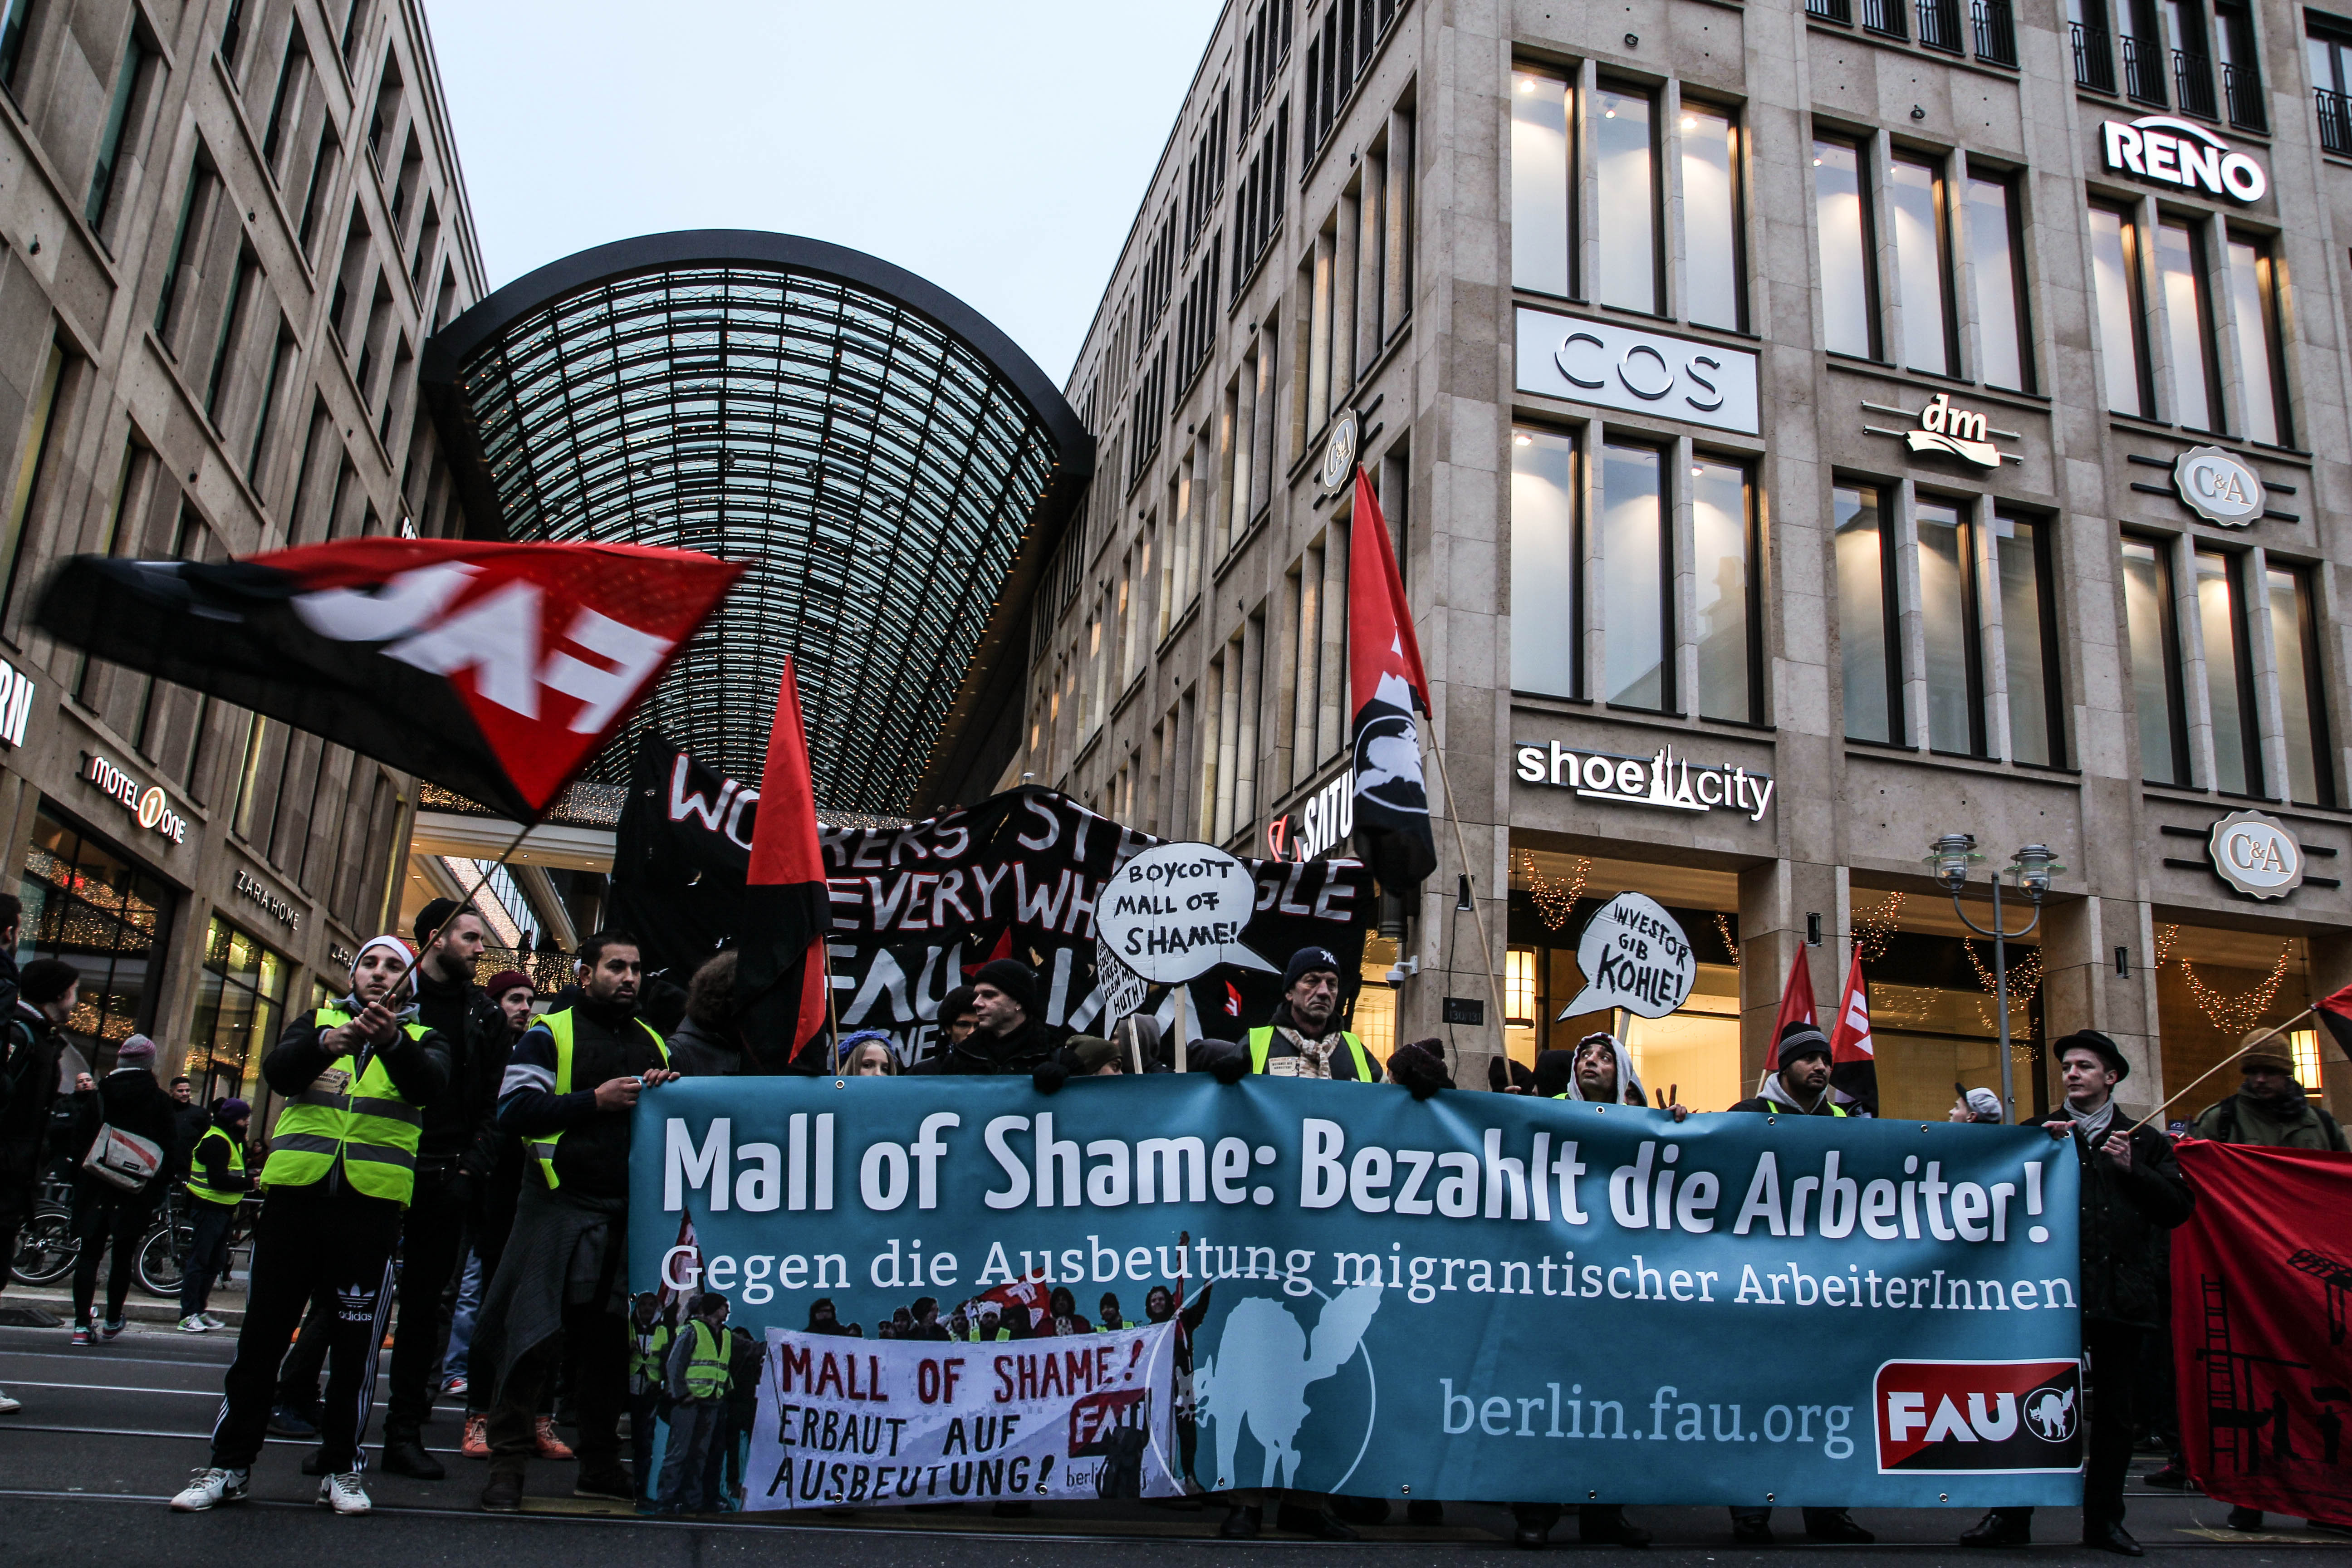 Kampf Der Bauarbeiter Innen Der Mall Of Berlin Geht Juristisch In